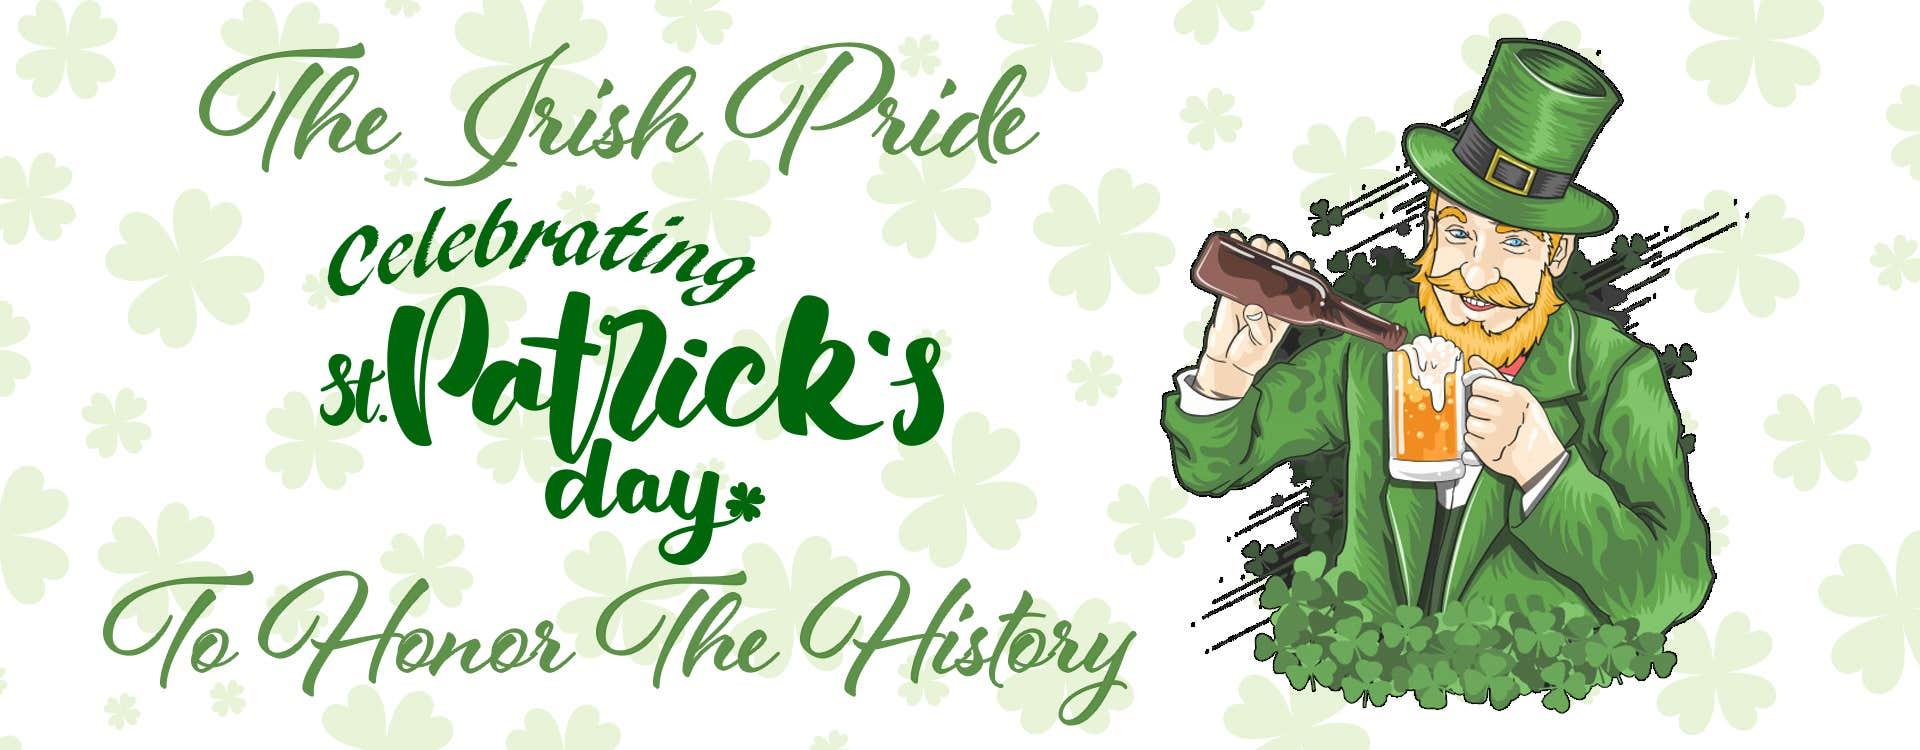 The Irish Pride: Celebrating St. Patrick's Day To Honor The History